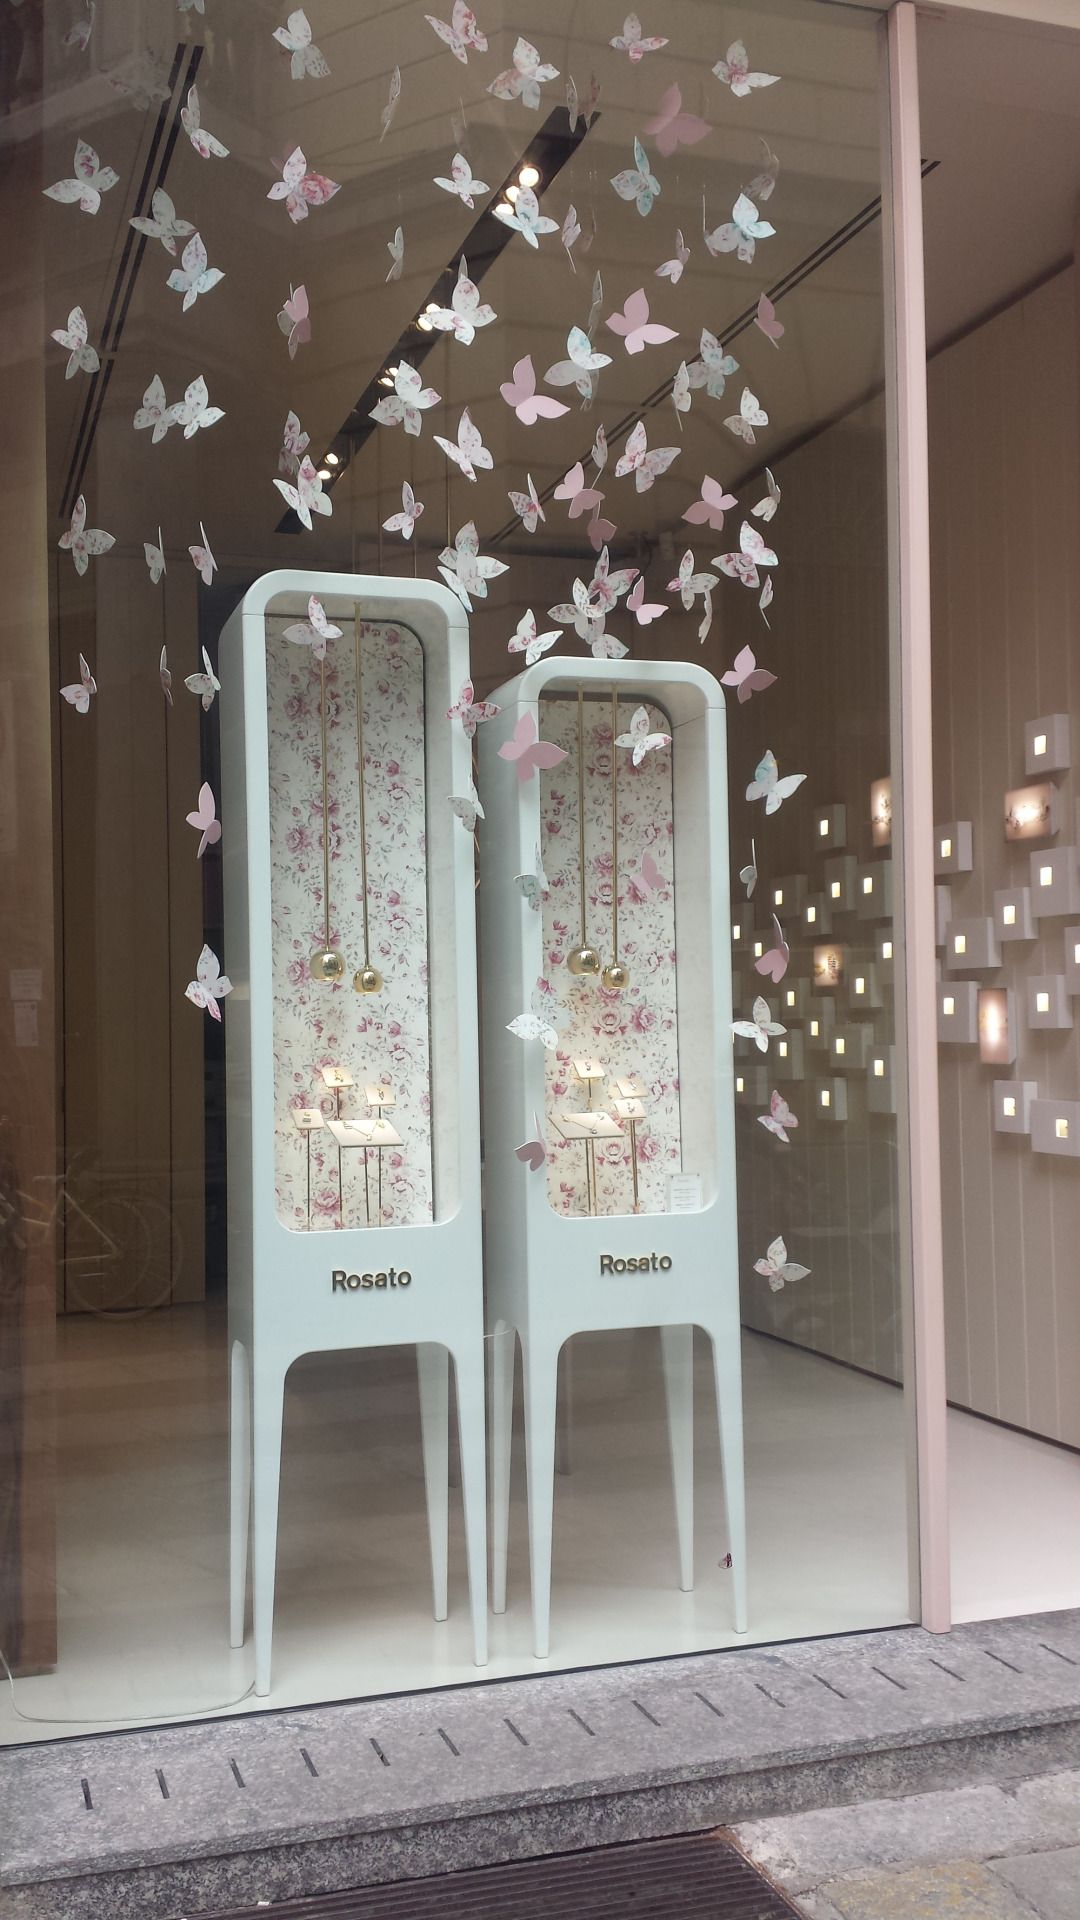 Window display ideas for jewelry  rosato jewellerymilan italy